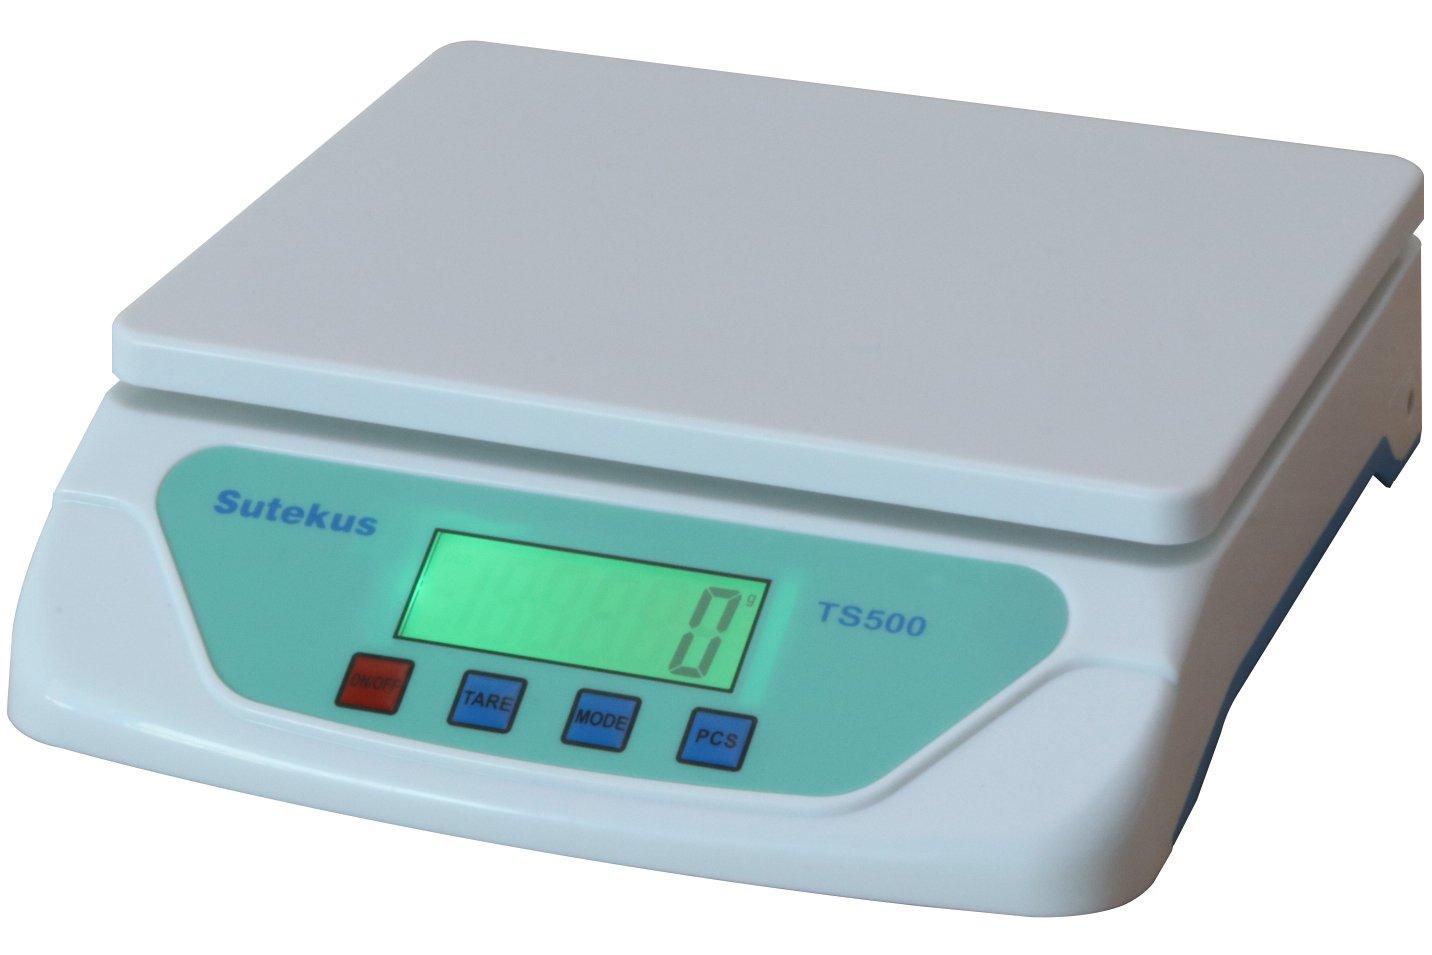 Sutekus 1g単位 最大25Kgまで計量可能 デジタル台はかり